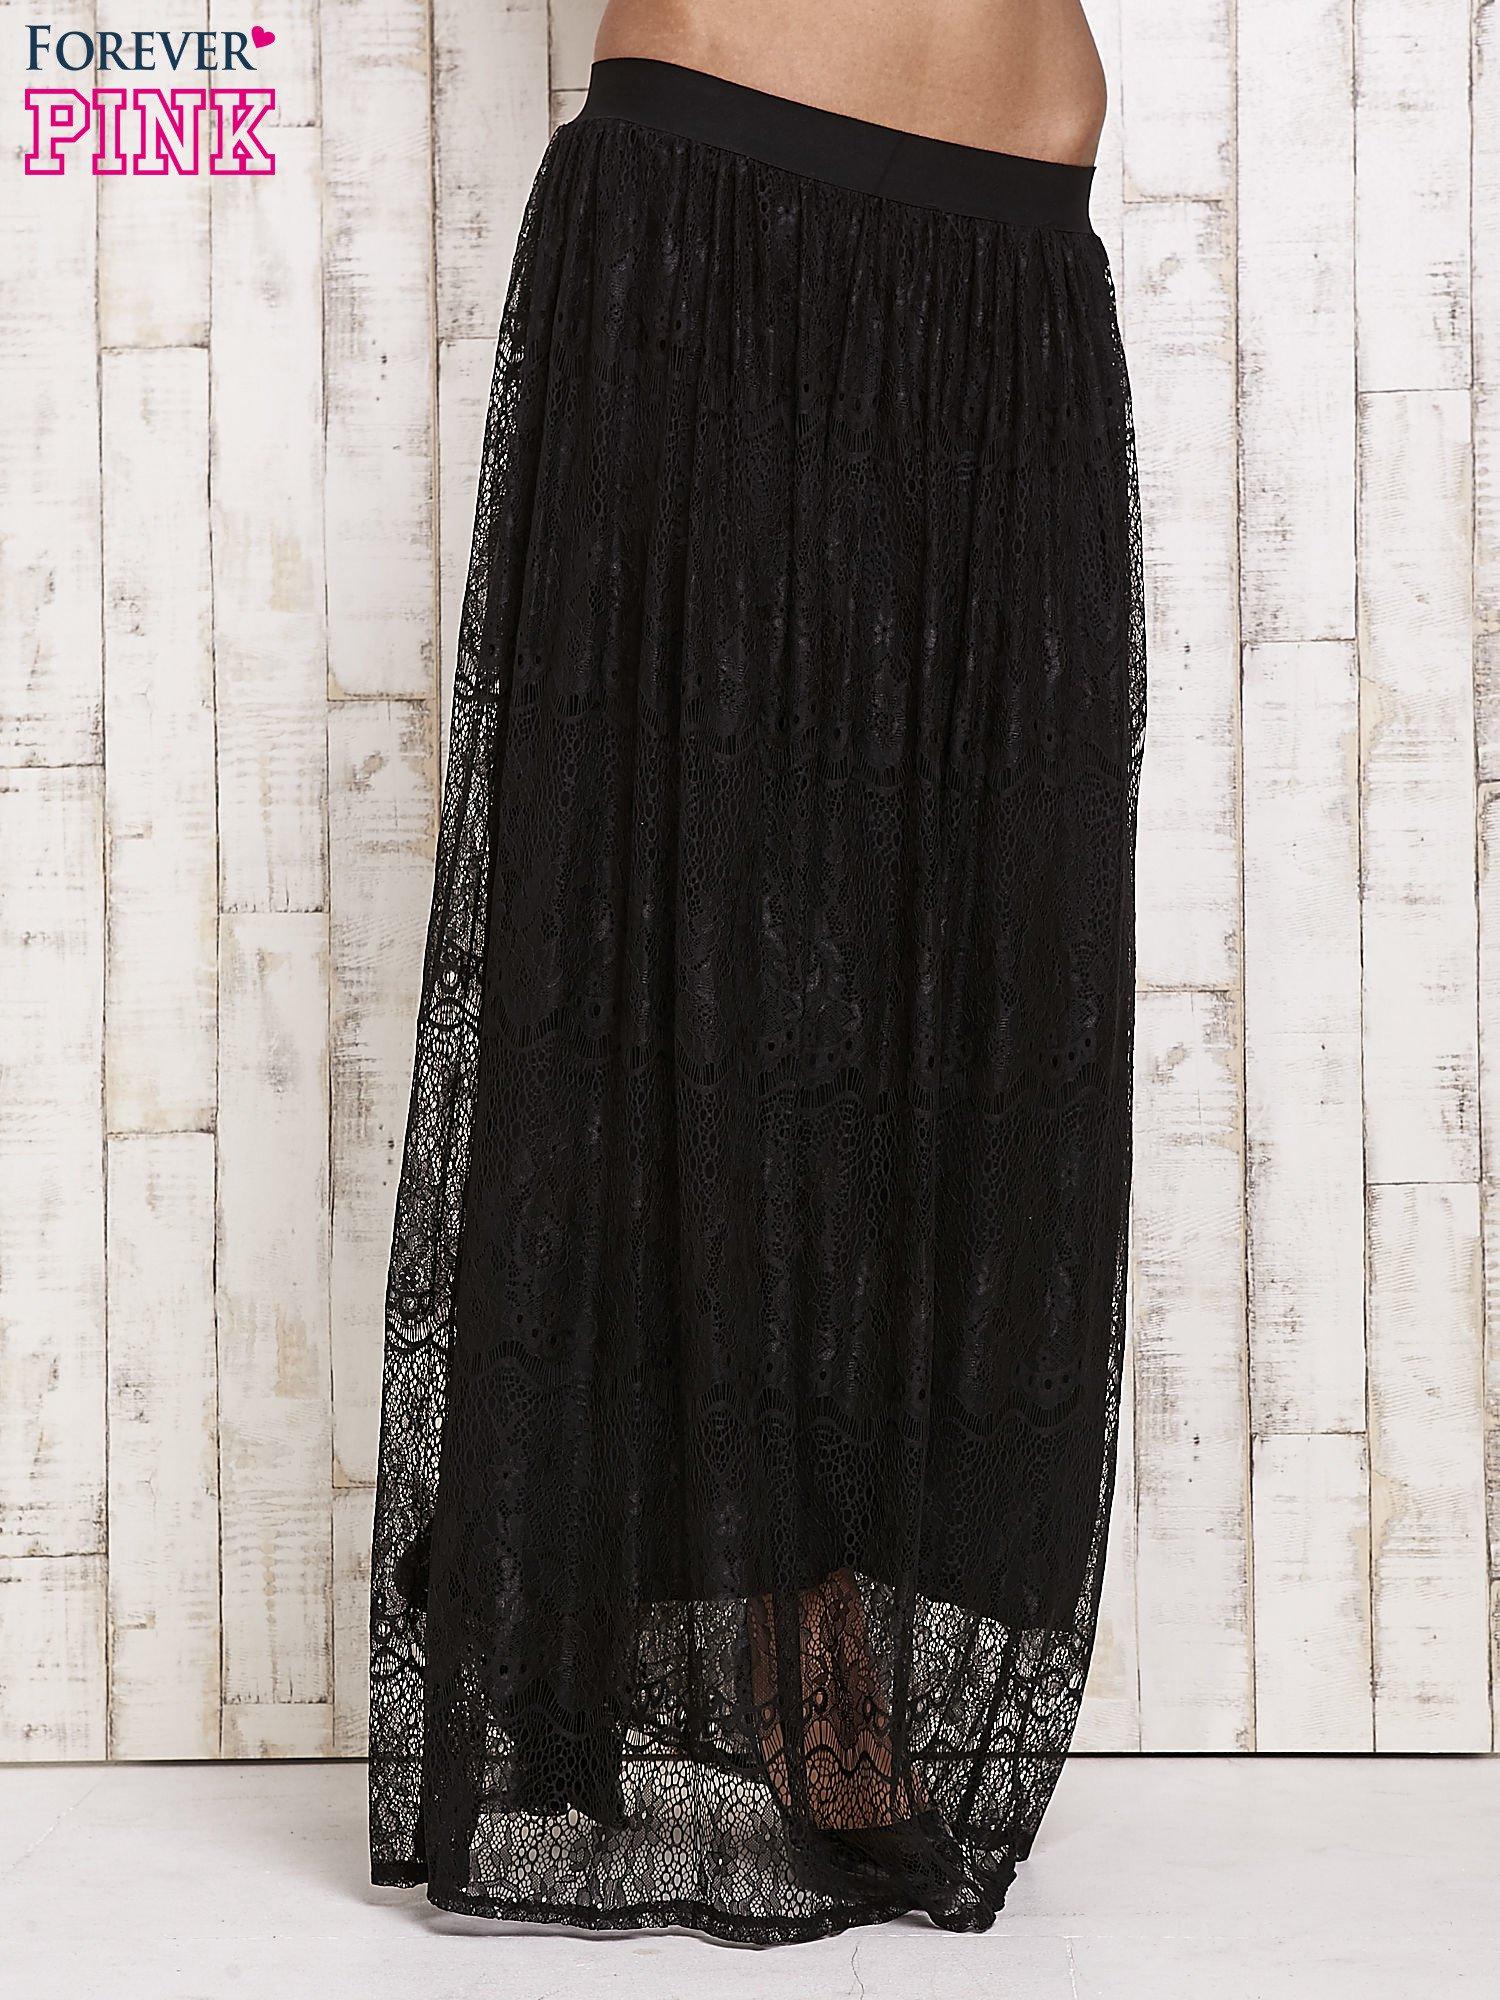 0cdd28cd433f Czarna koronkowa spódnica maxi - Spódnica plisowana - sklep eButik.pl